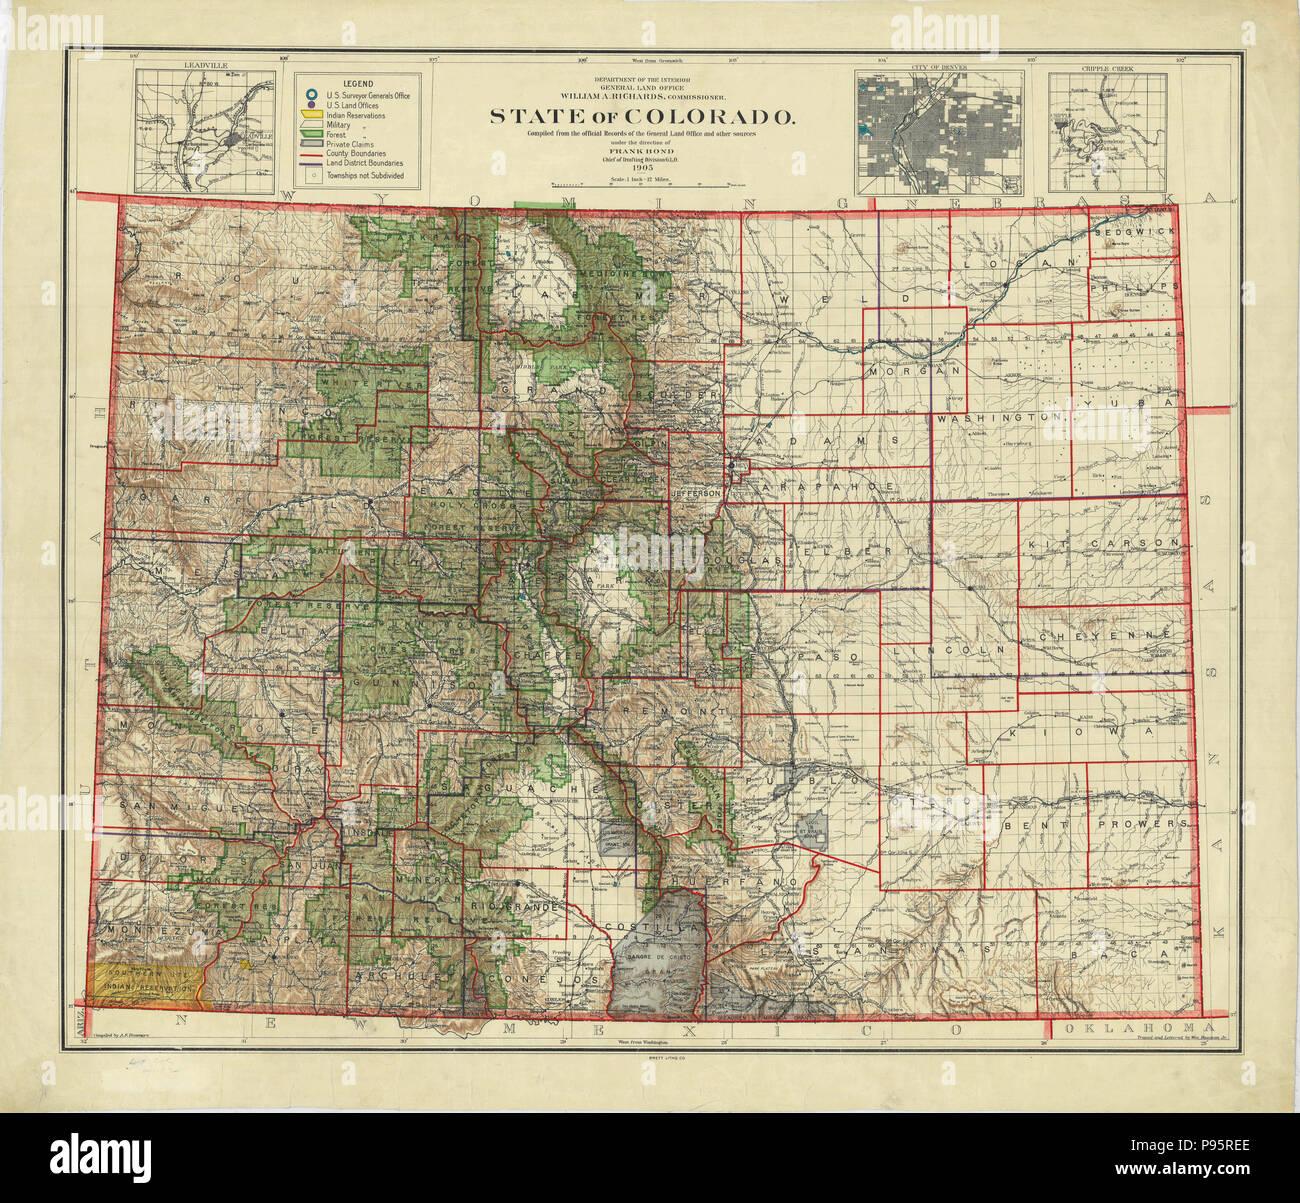 Colorado Karte Fluss.Karte Von Colorado Zustand Stockfotos Karte Von Colorado